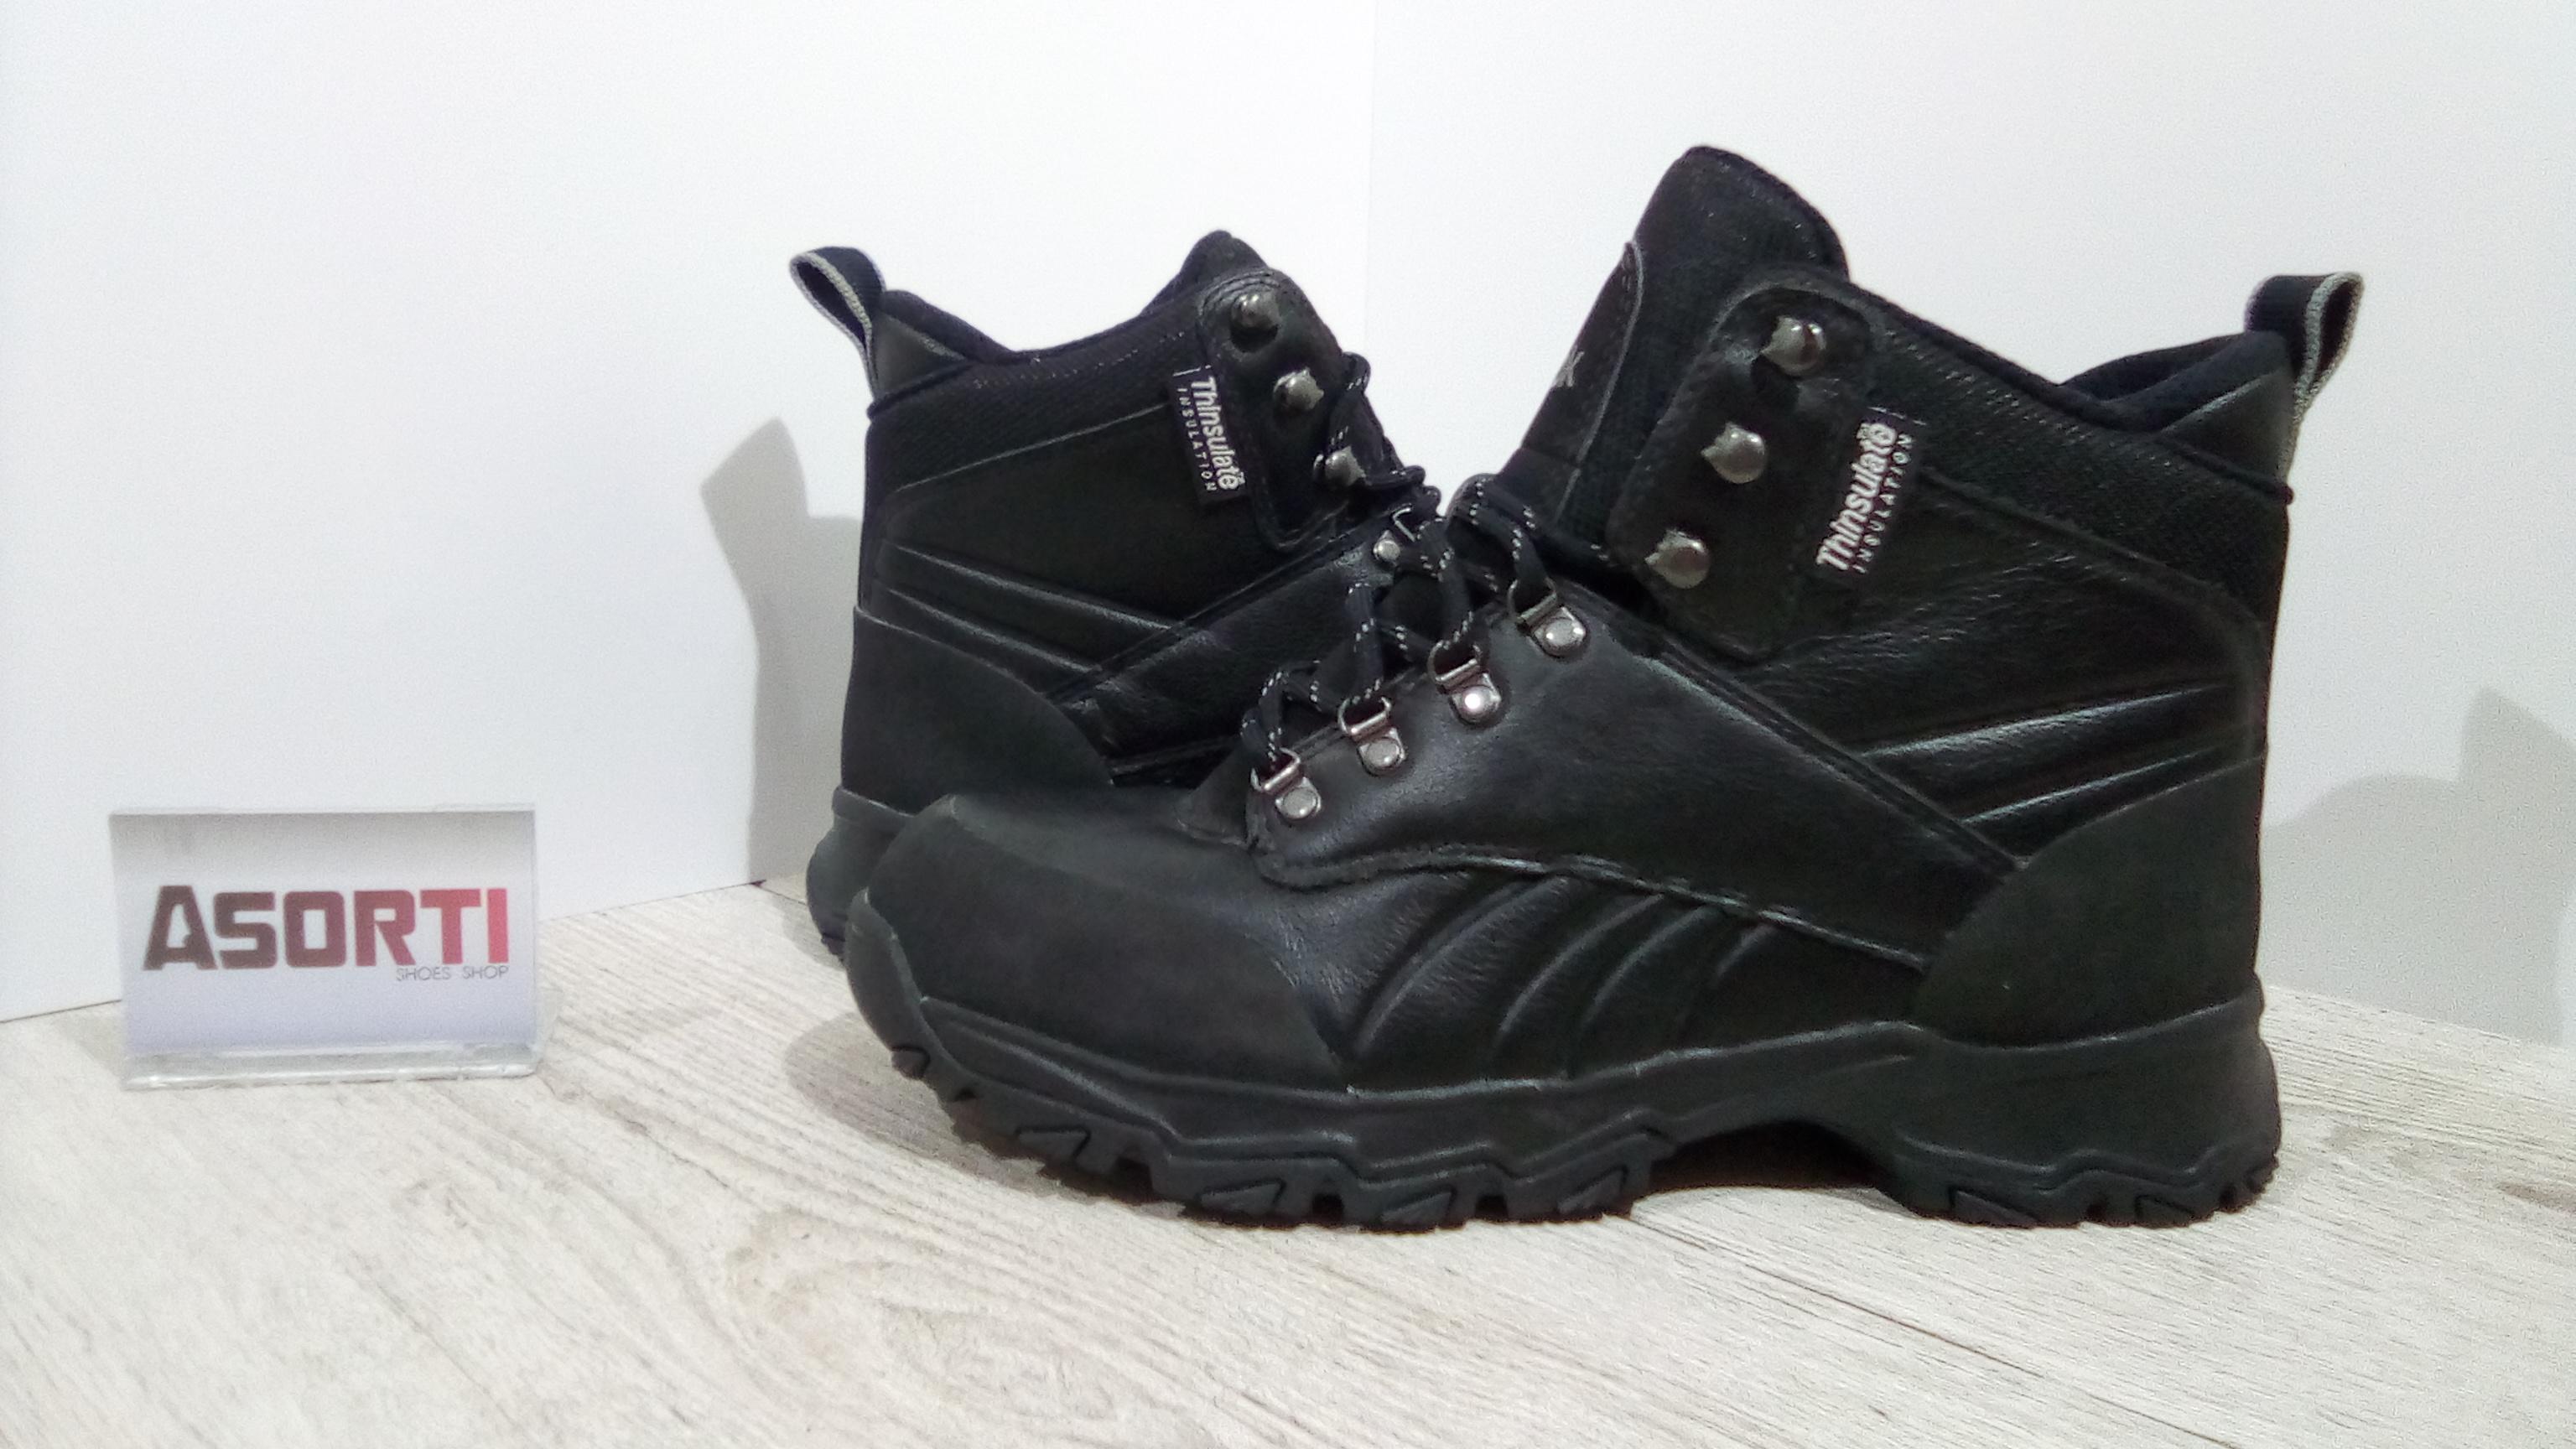 4e615baf Мужские утепленные ботинки Reebok Crestview TR II (J16890) черные ...